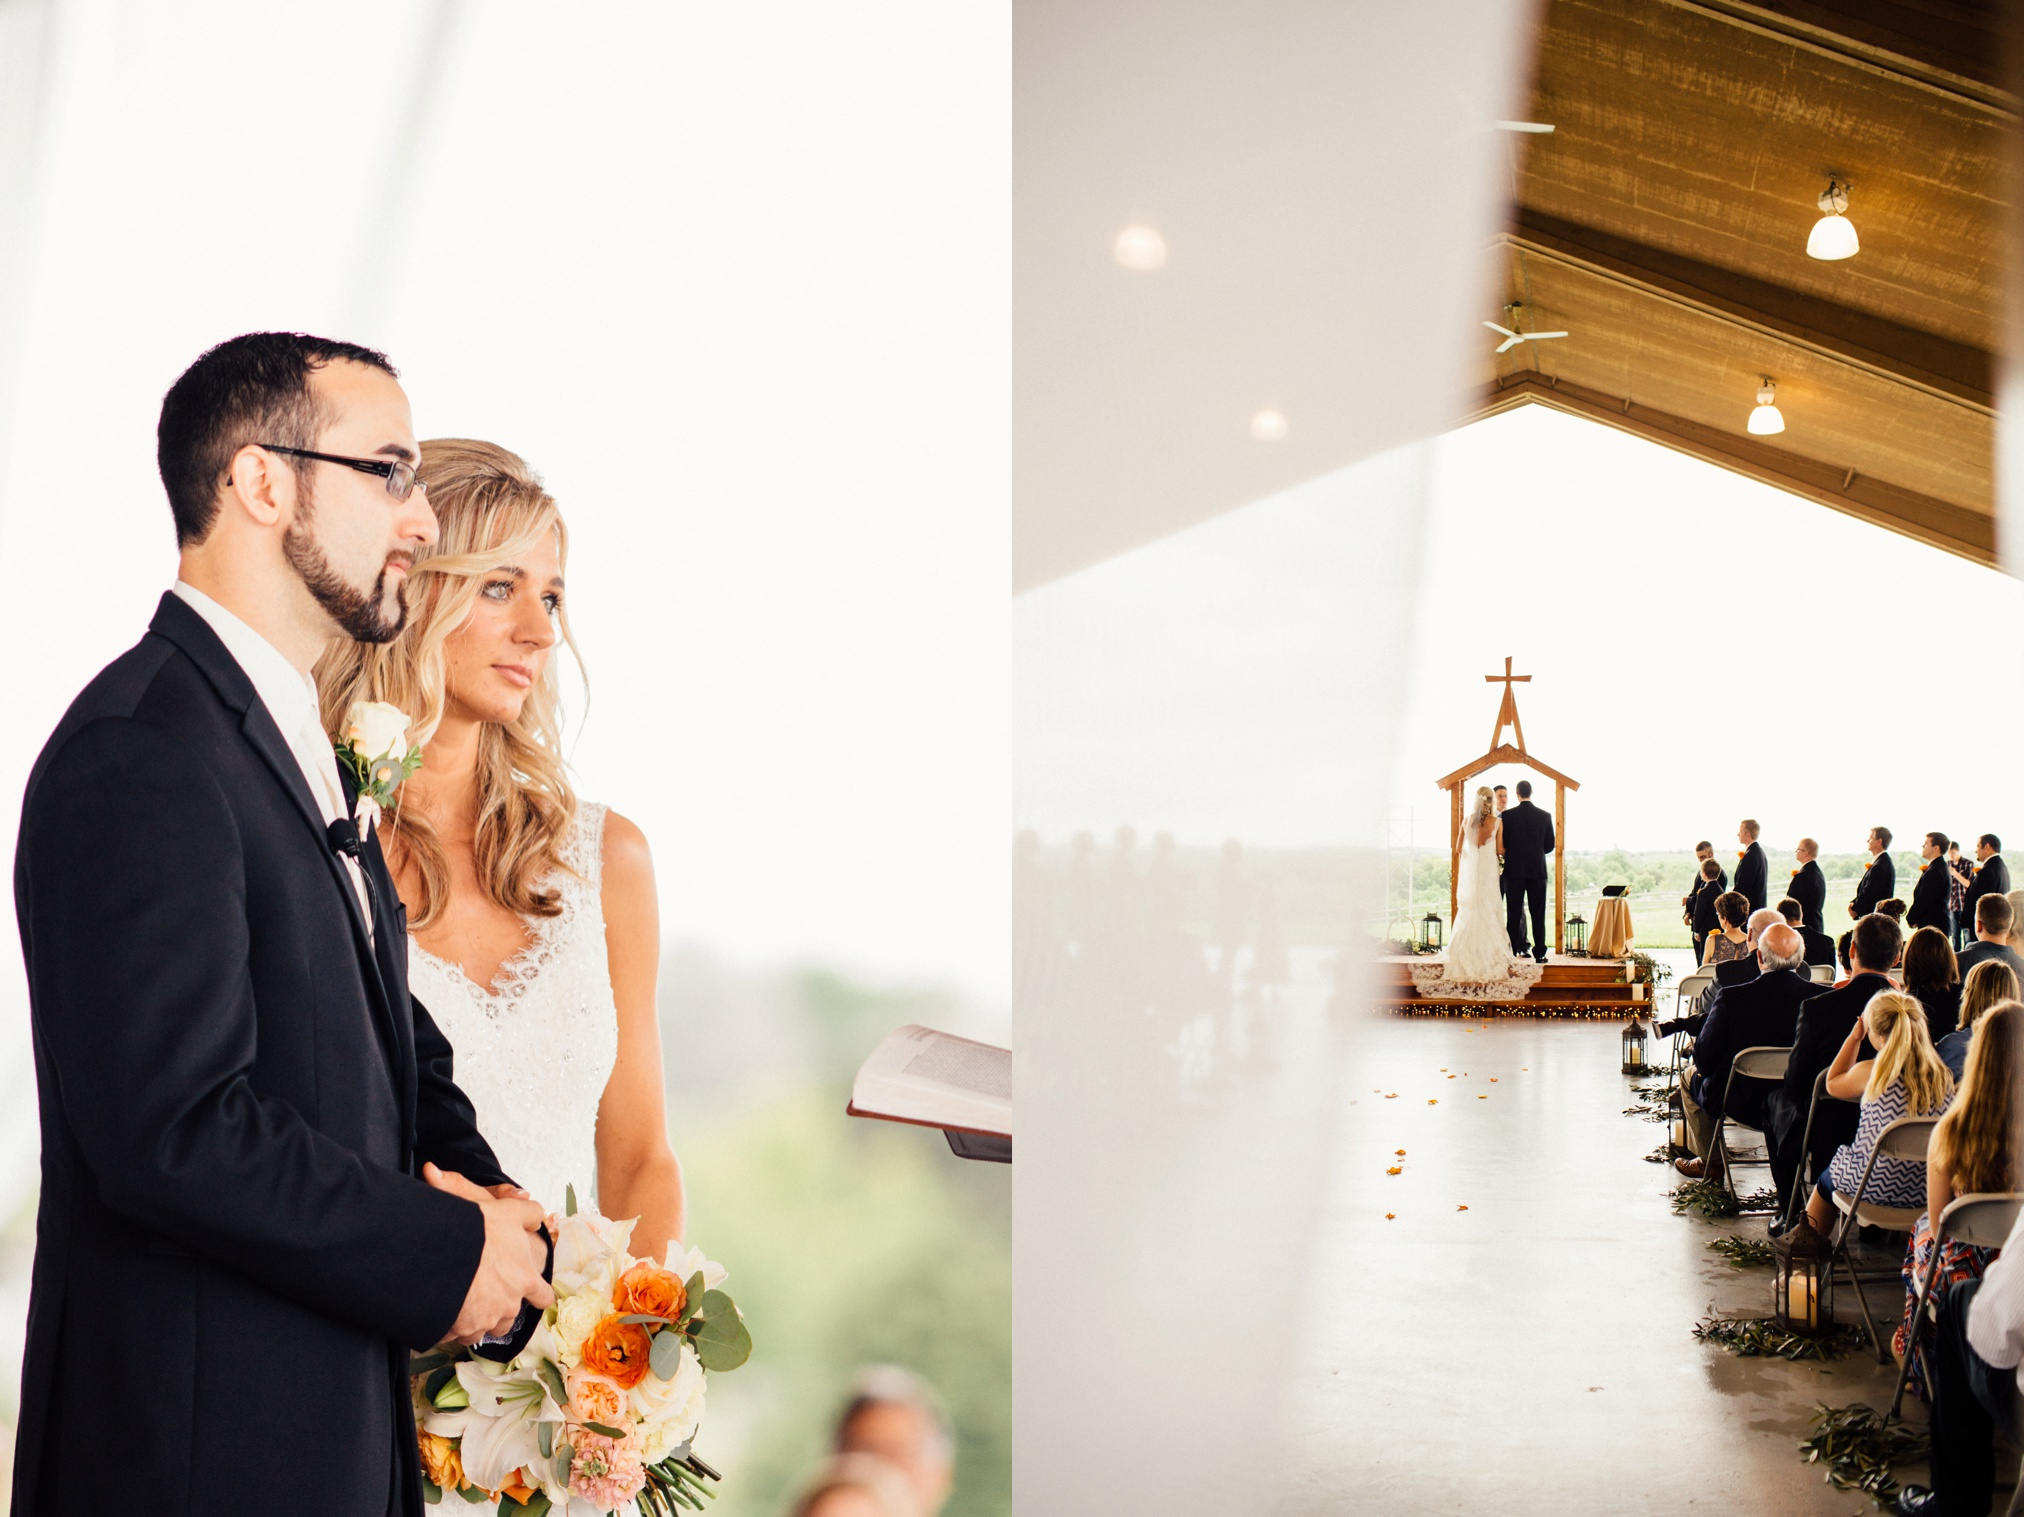 schmid_wedding-481.jpg